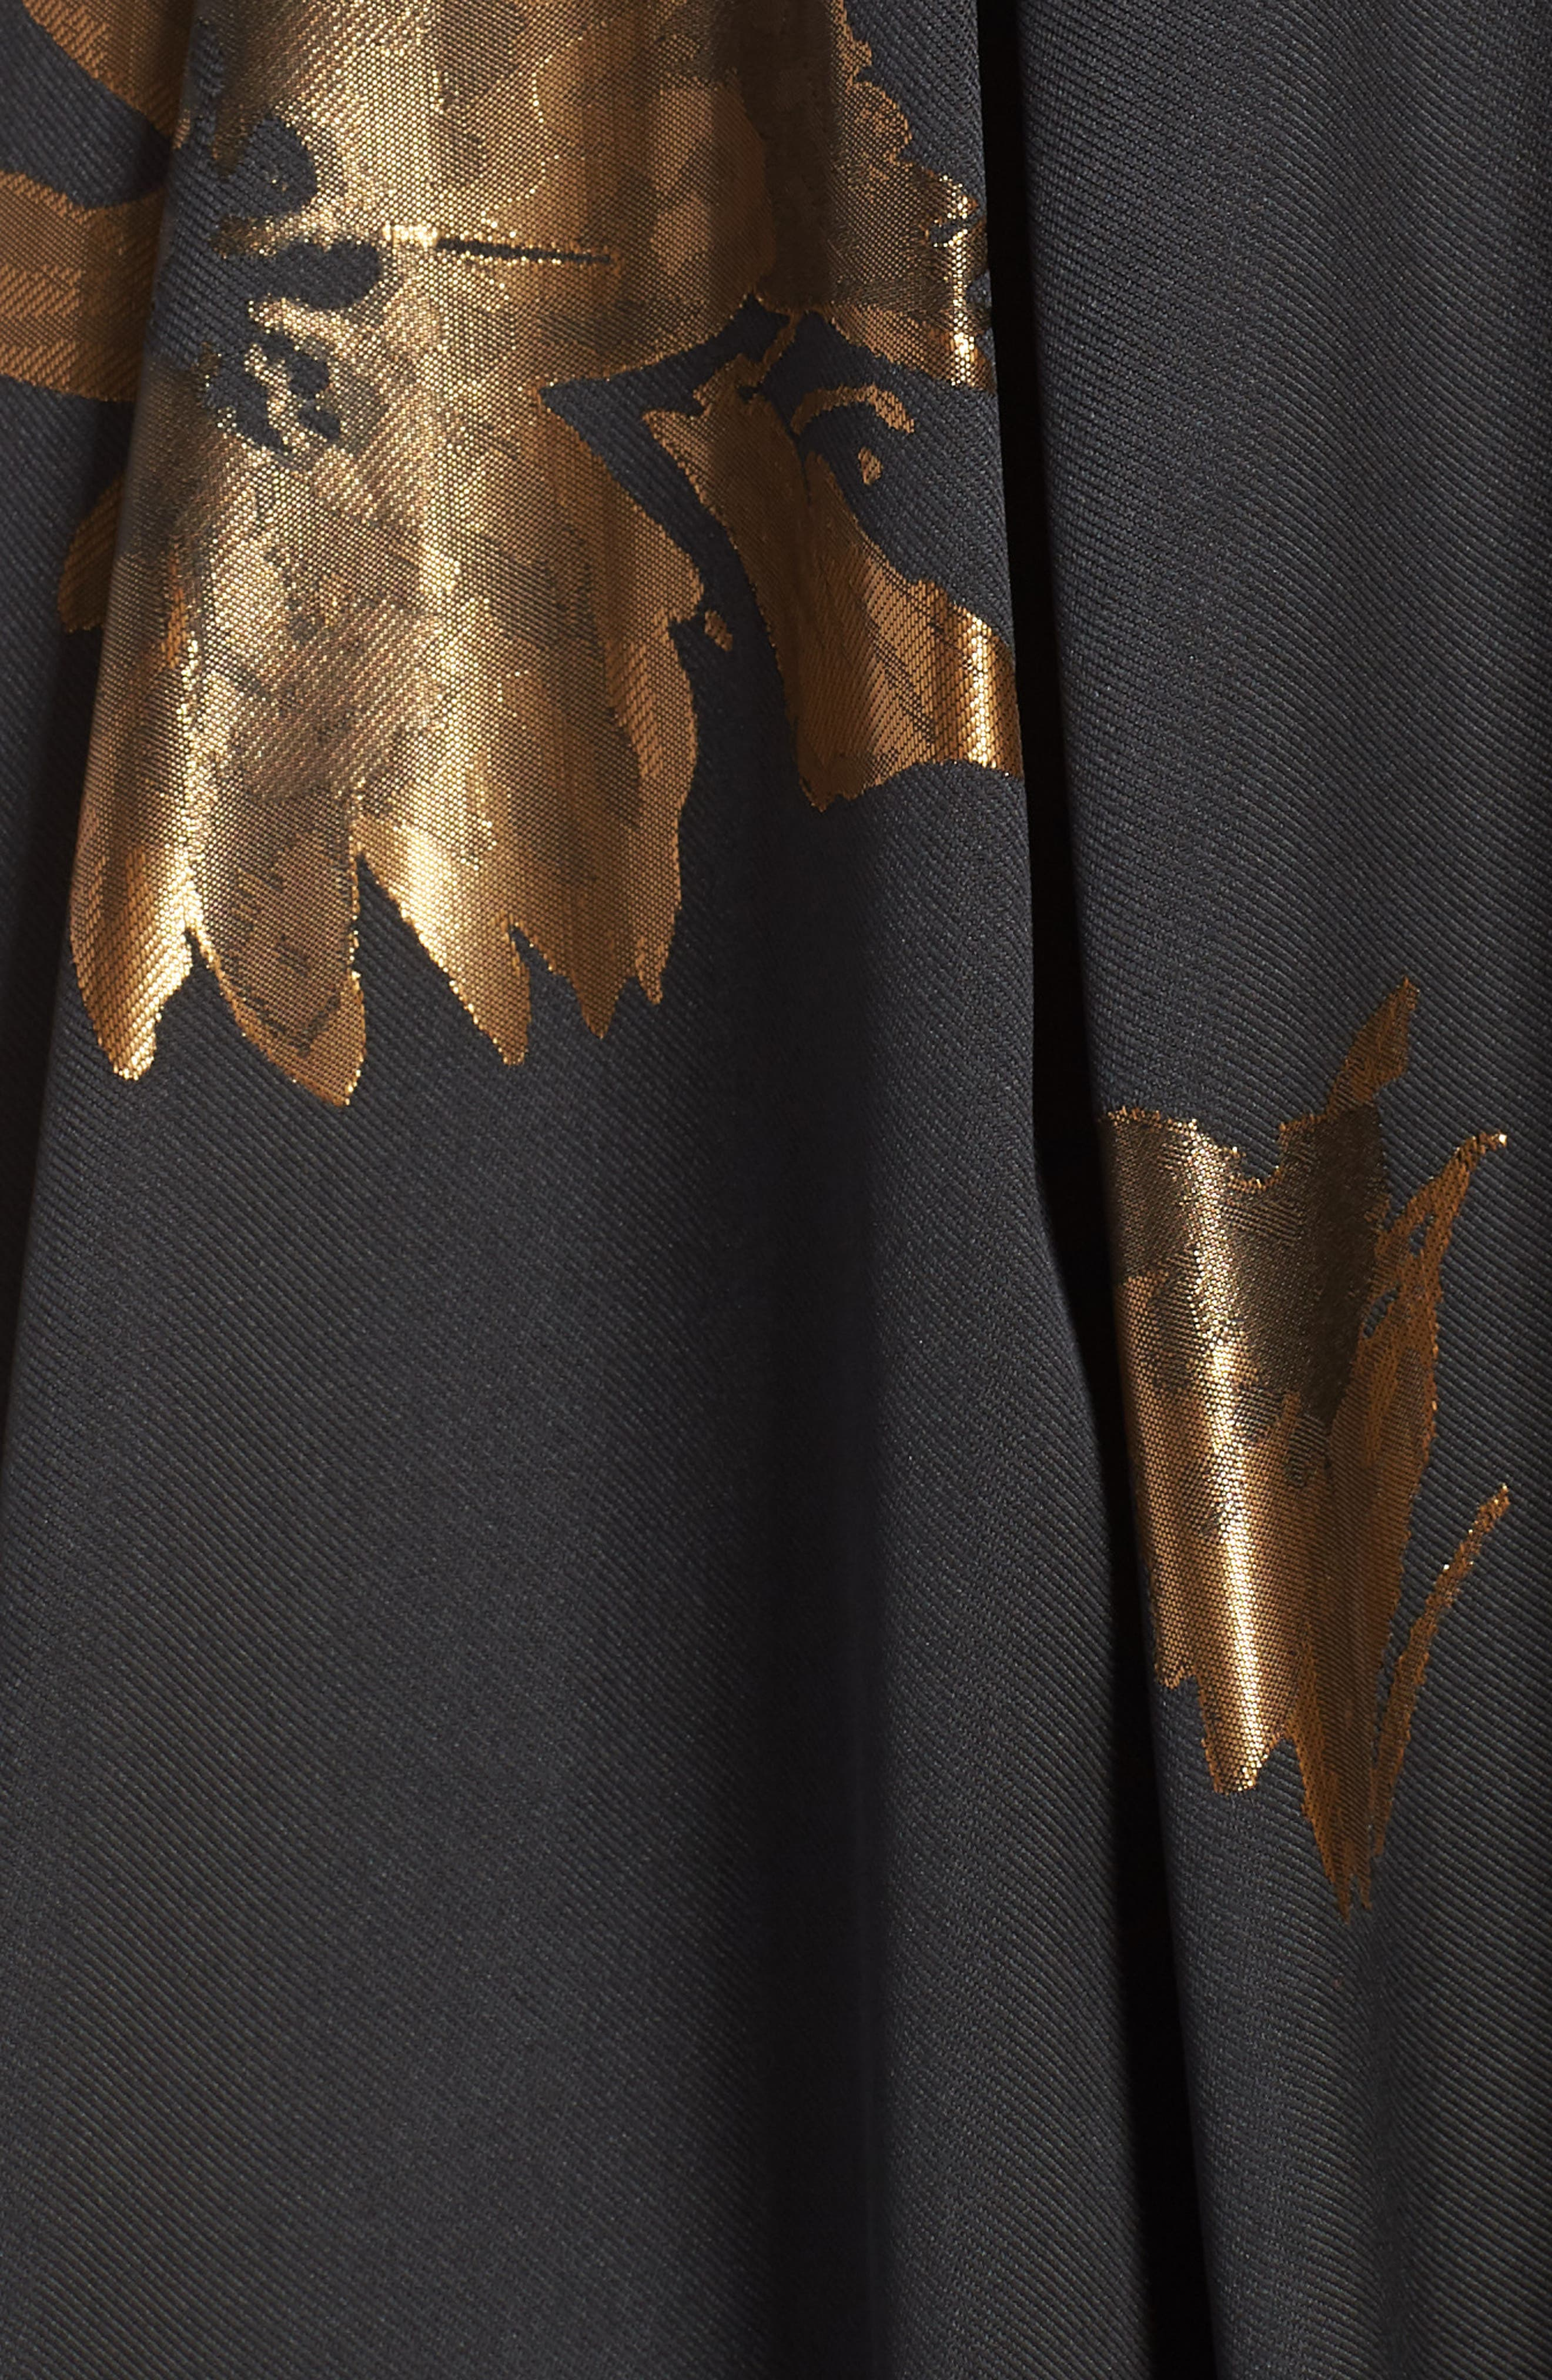 ELIZA J, Metallic Print Gown, Alternate thumbnail 6, color, 001